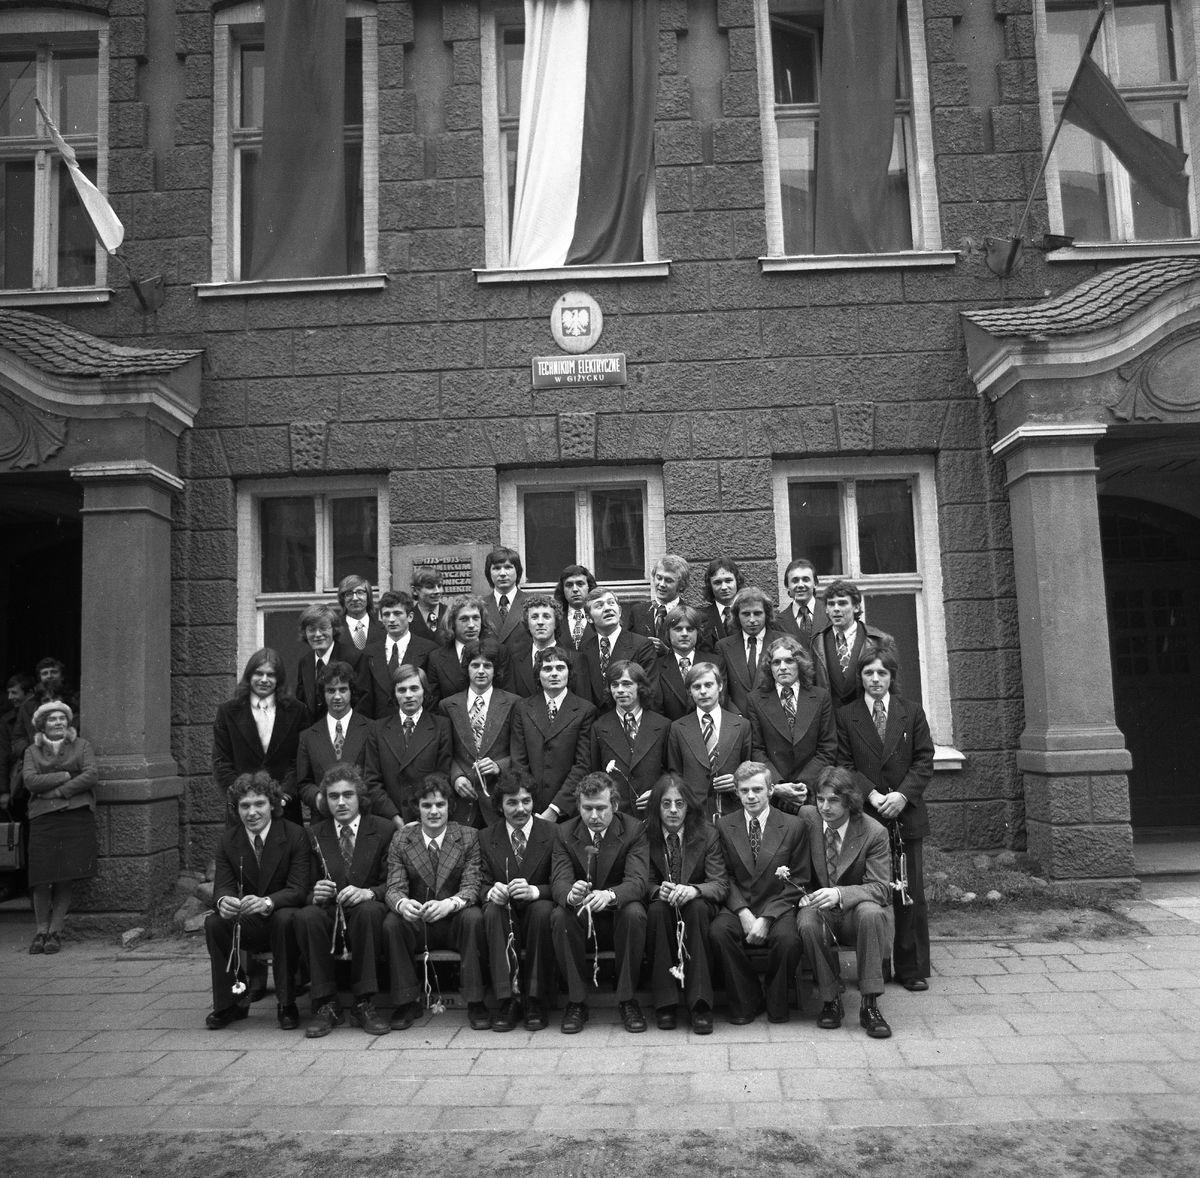 Zdjęcia klasowe, 1976 r.